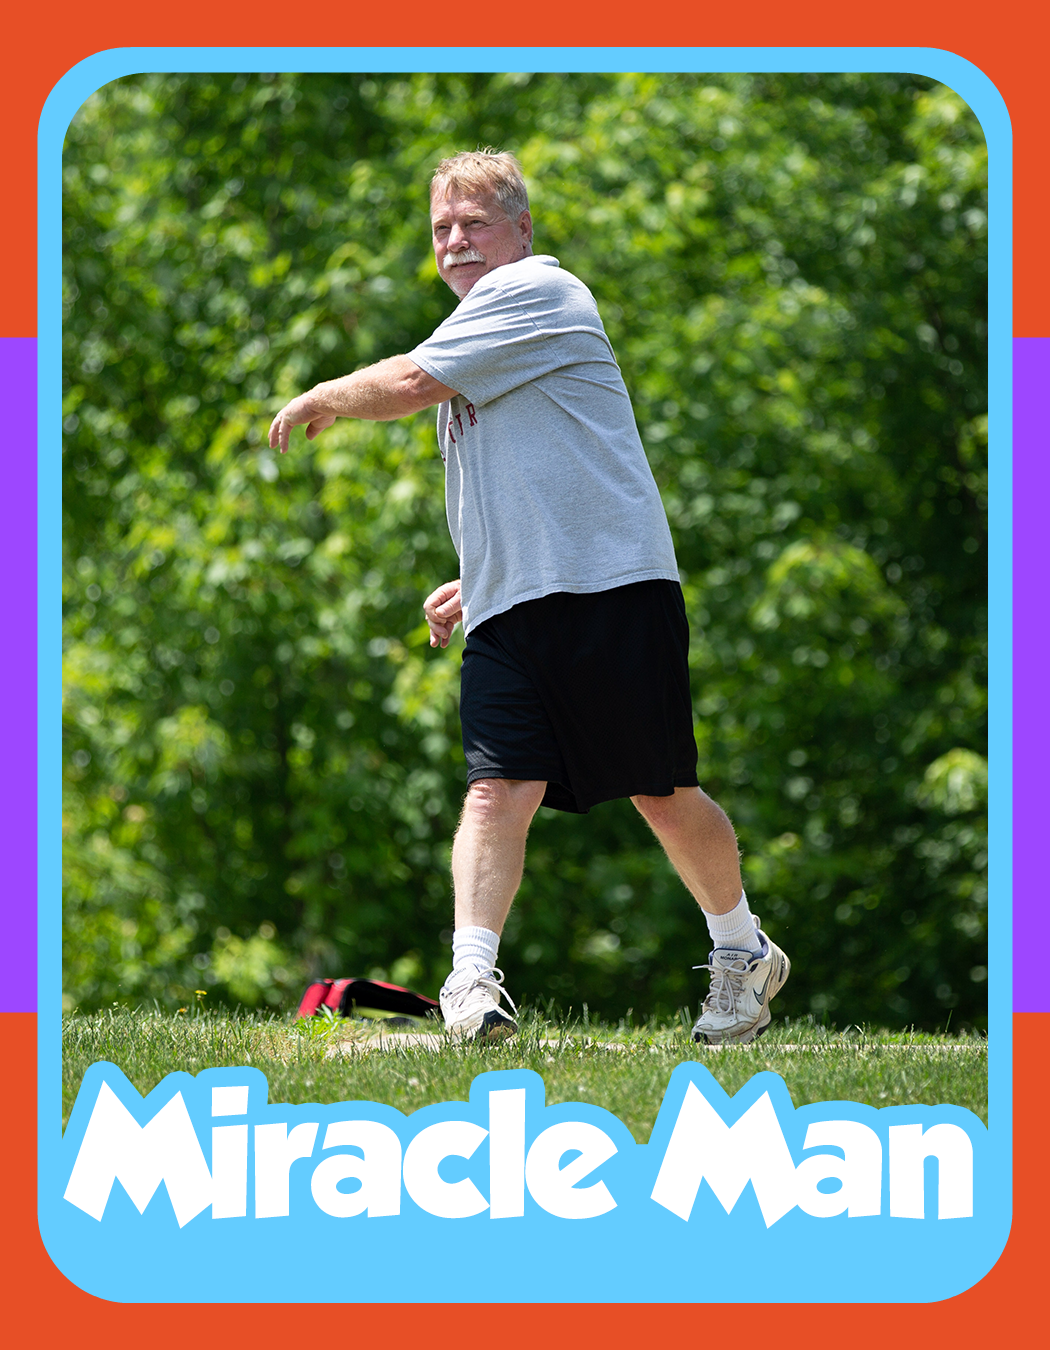 MarkPierce-MiracleMan.png